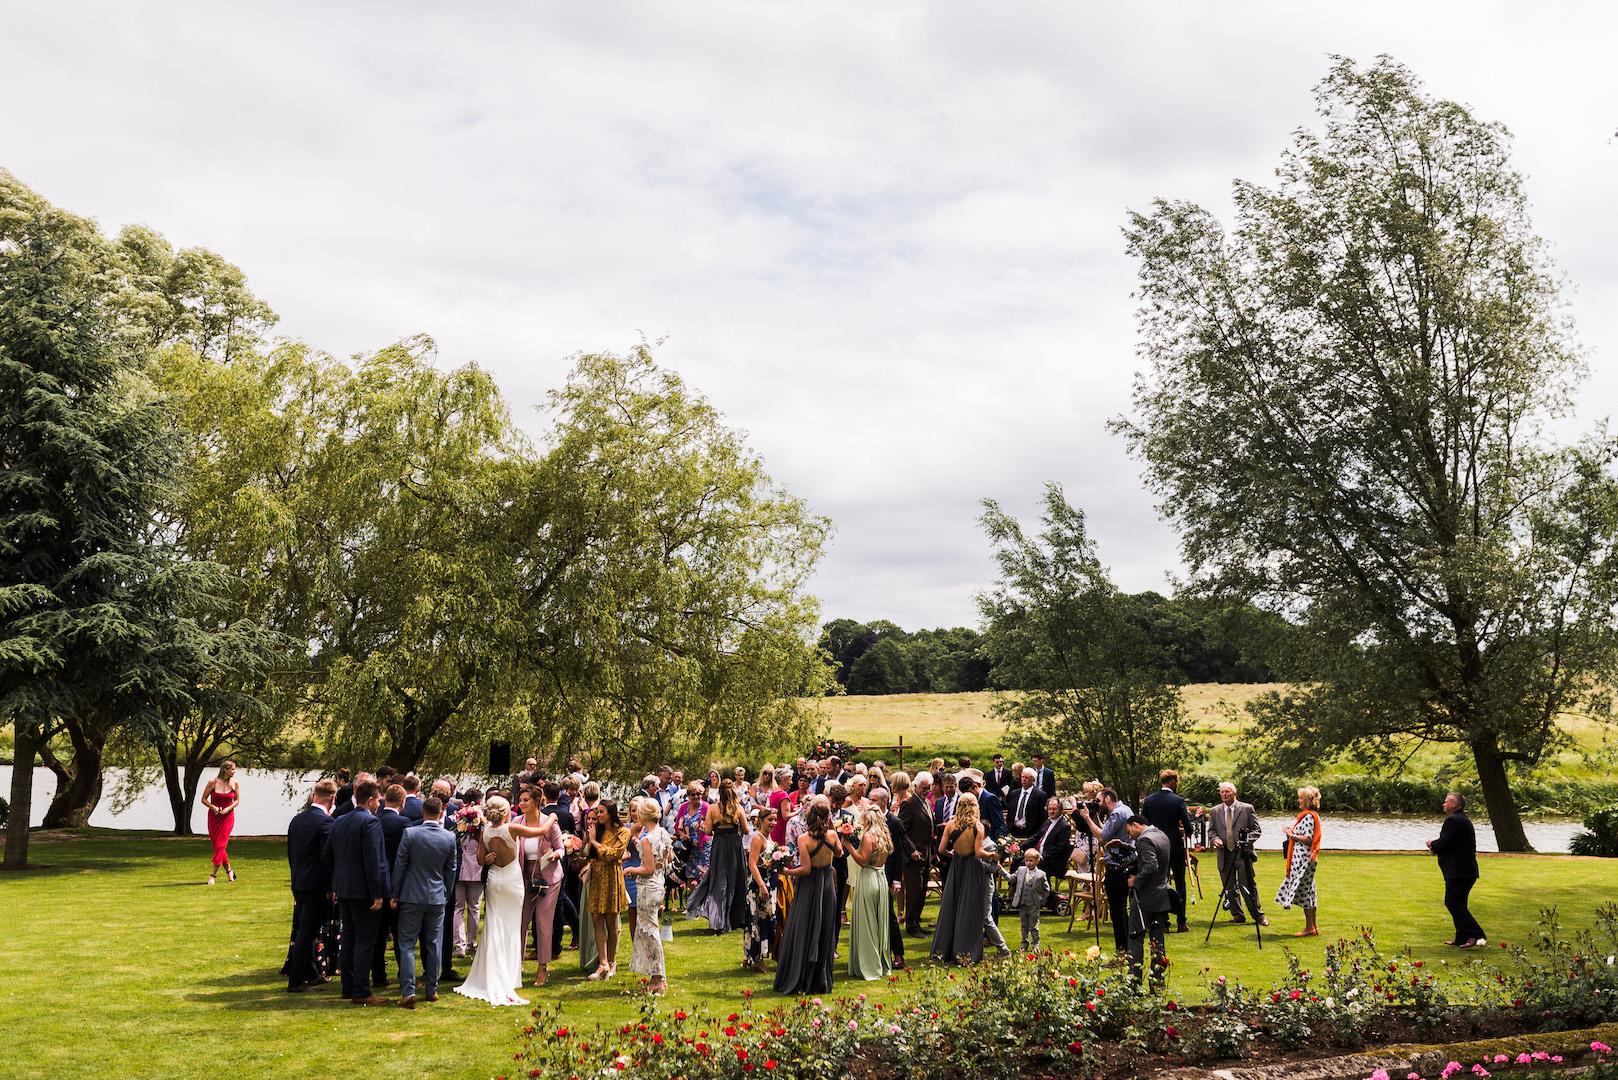 Sarah and Joe's PapaKata Sperry Wedding: The wedding party